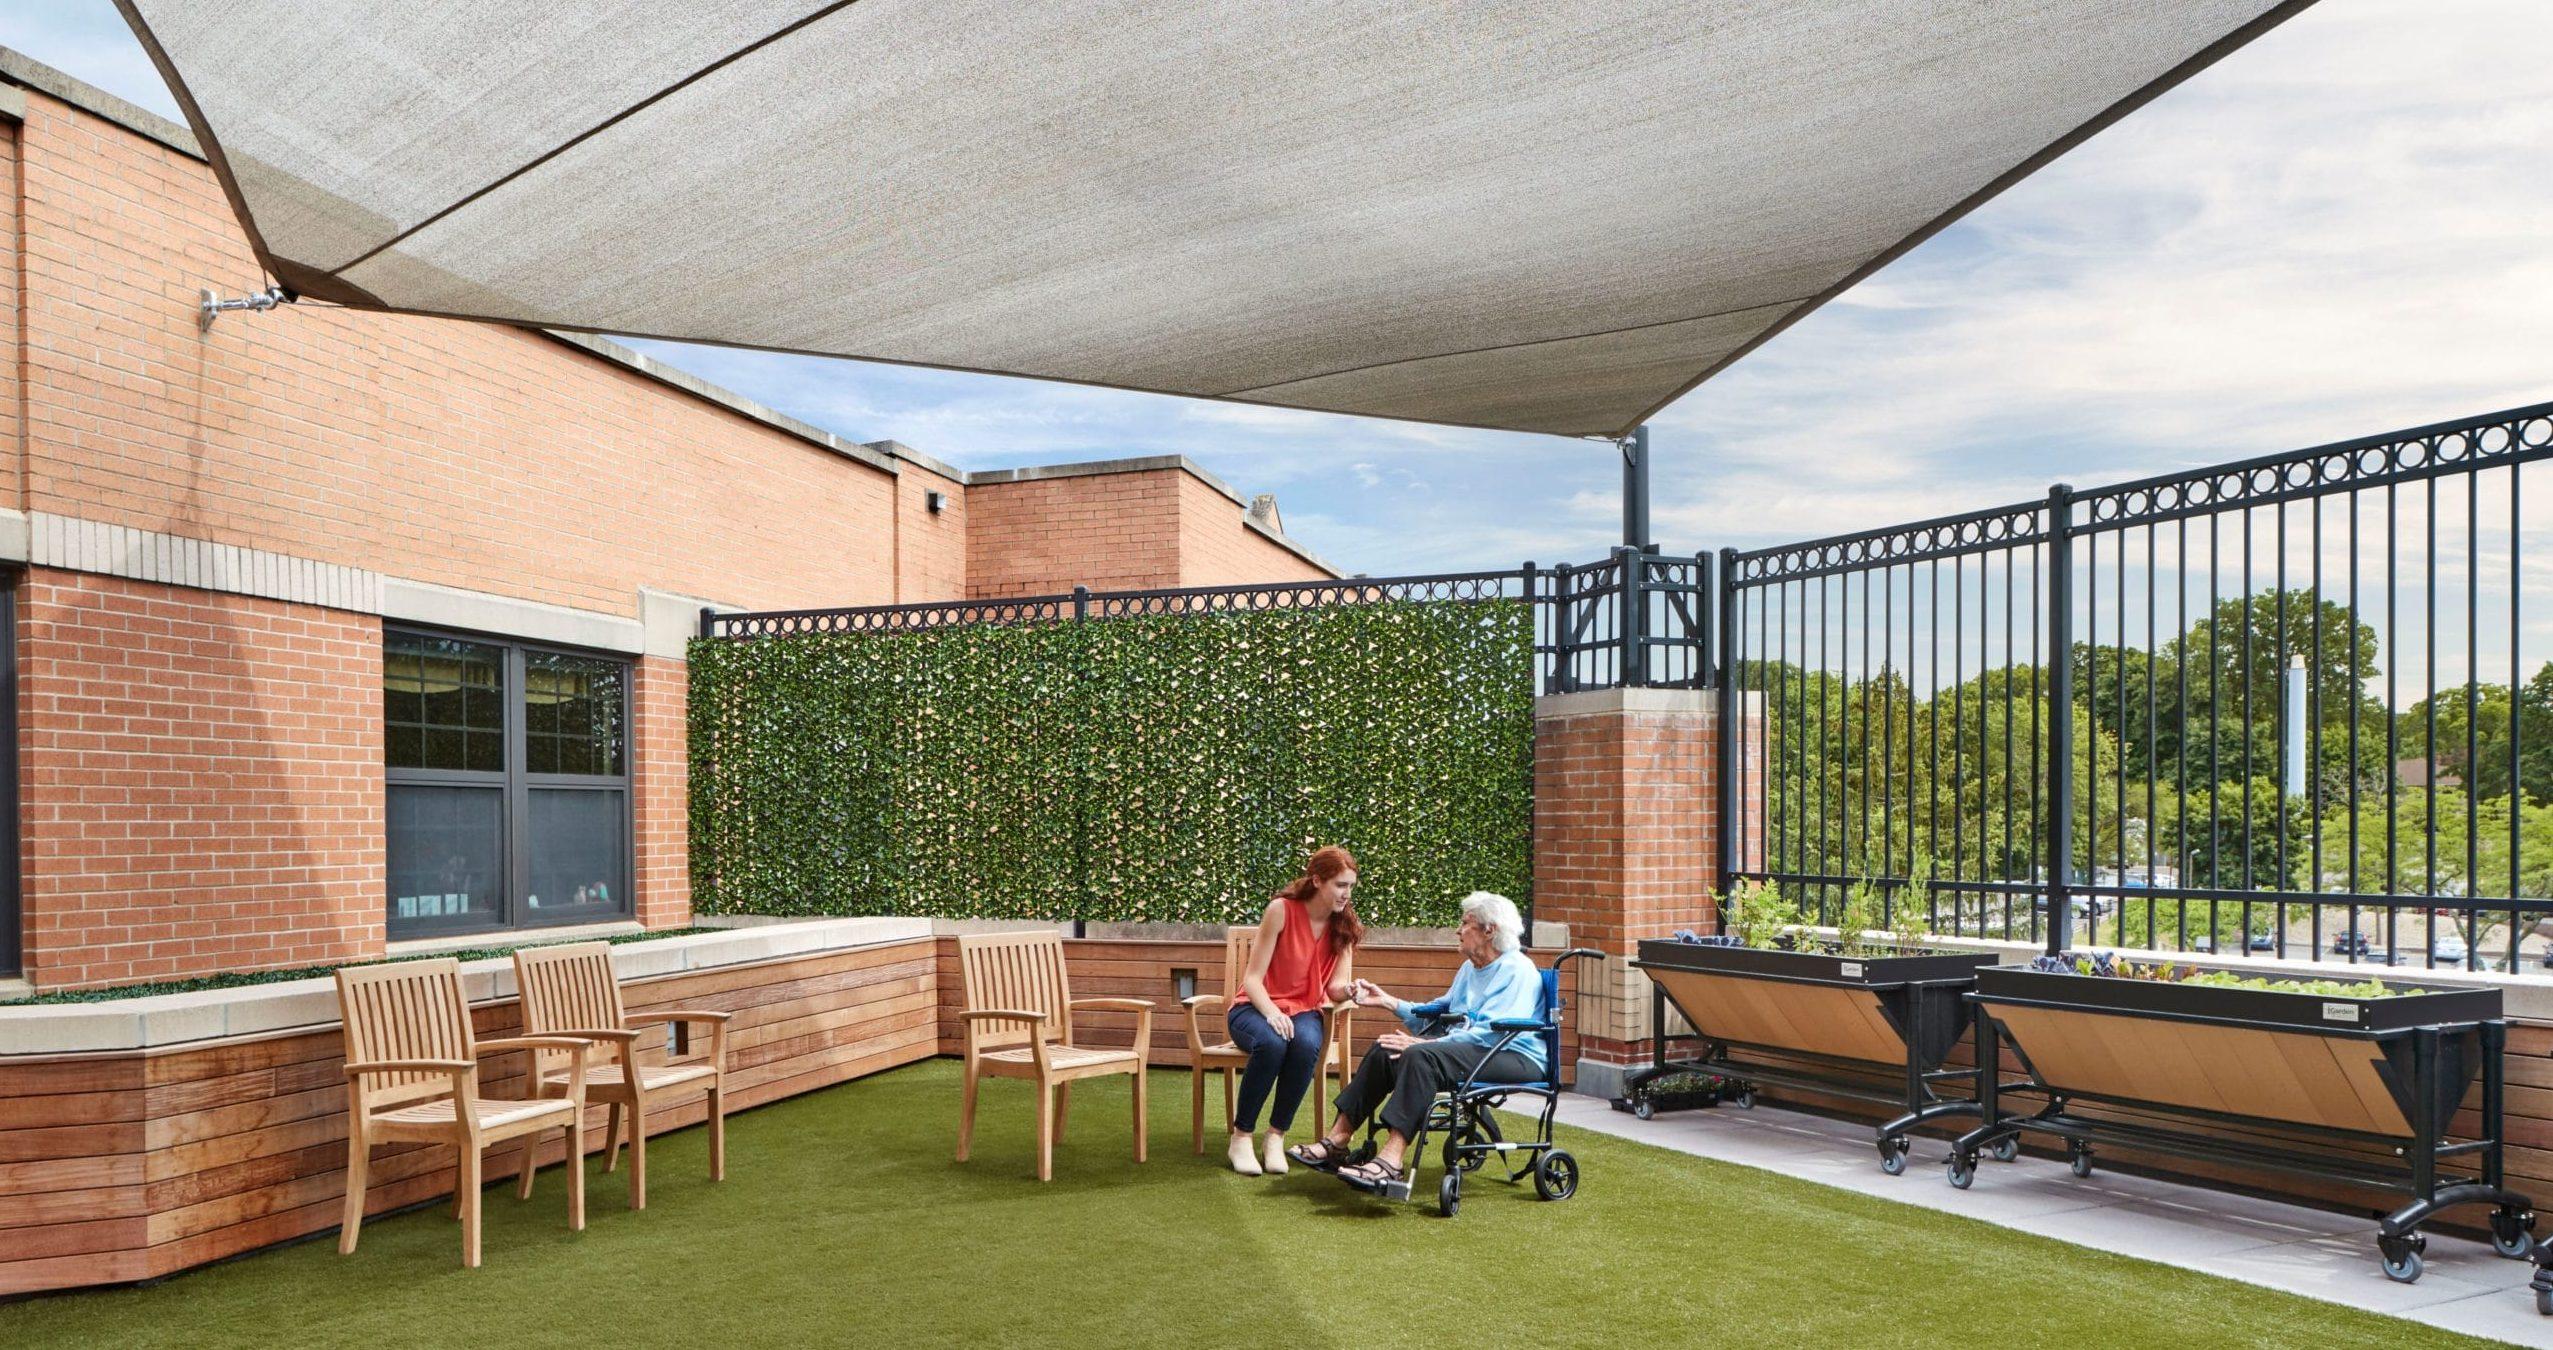 COVID-19 will push nursing home design forward